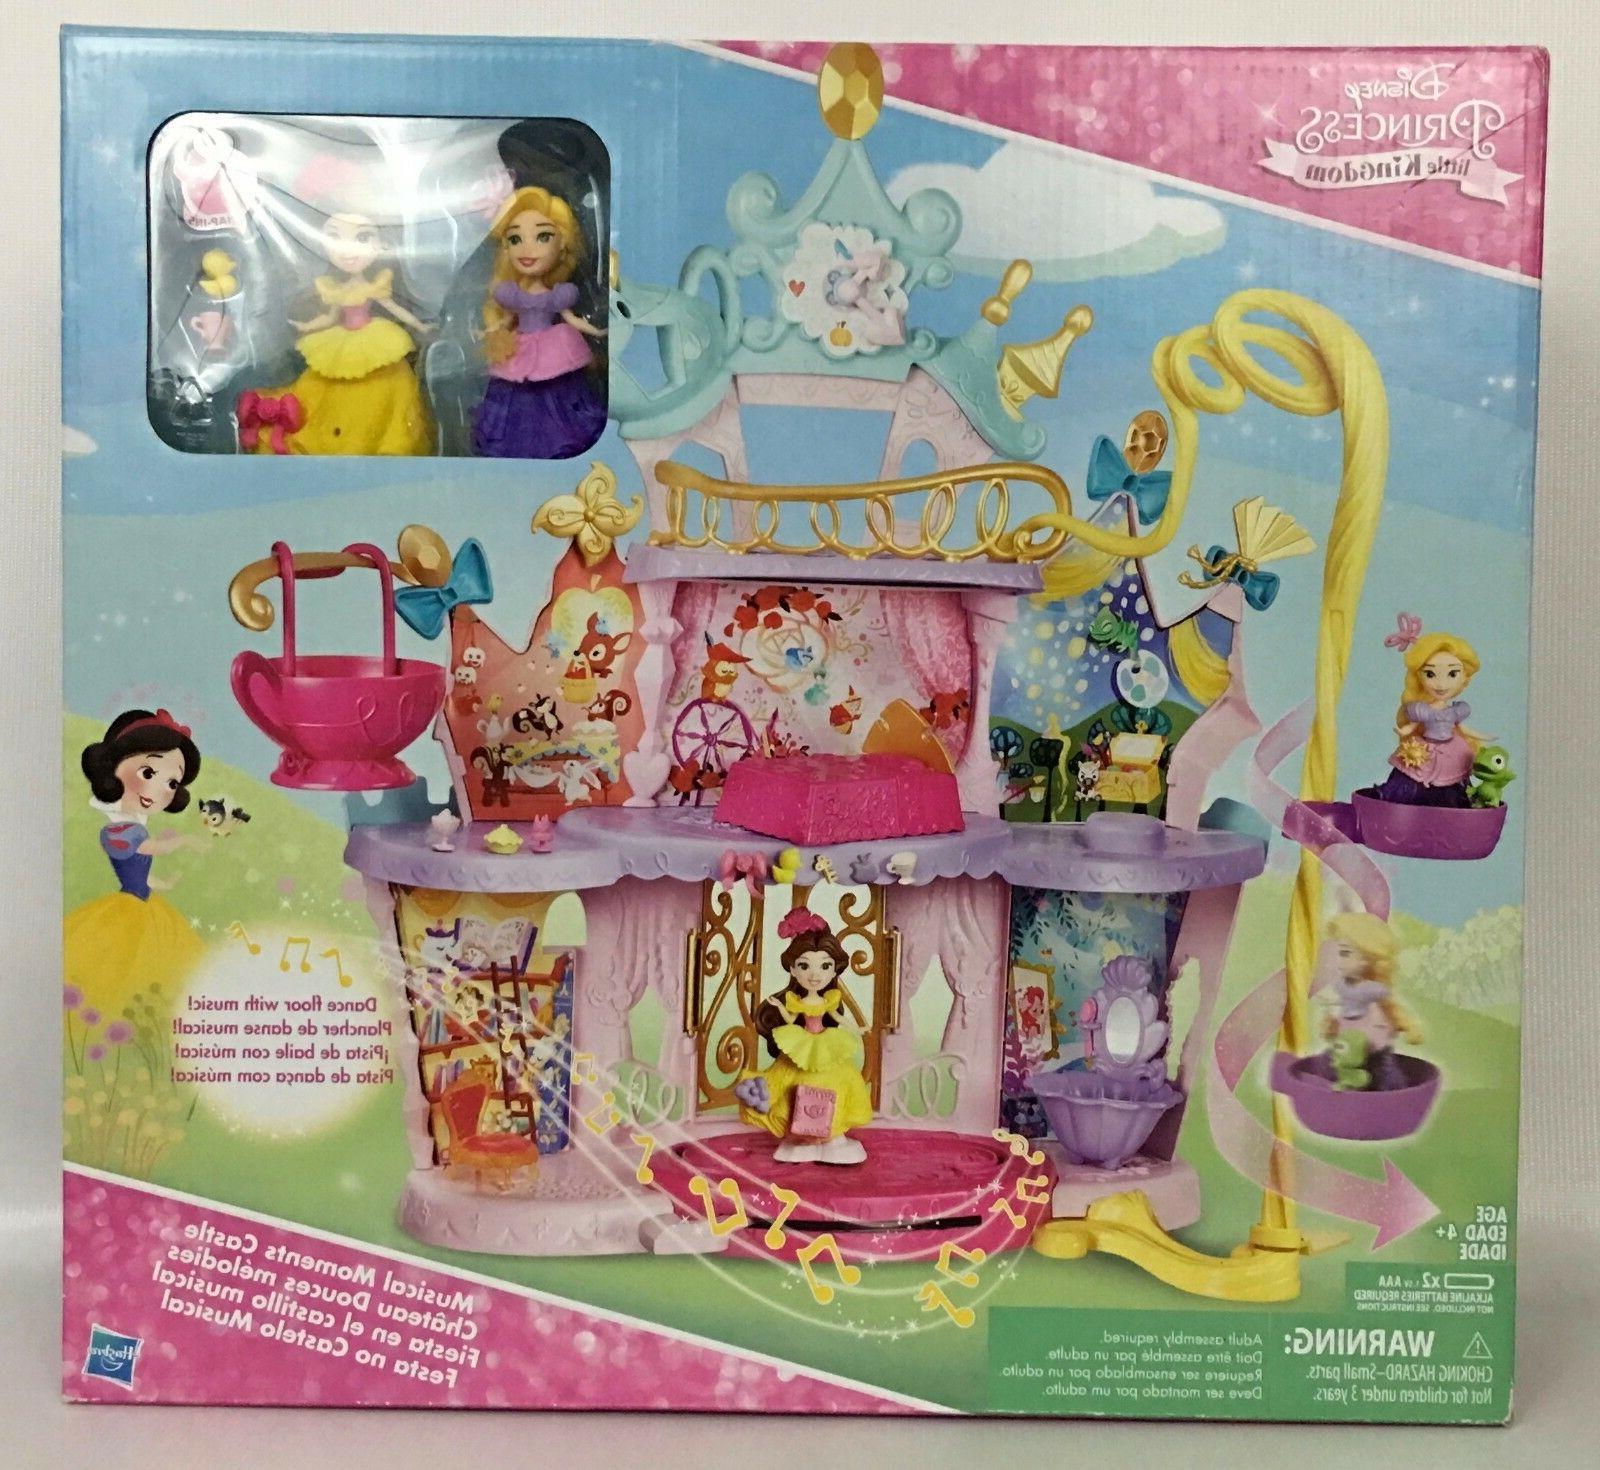 little kingdom musical moments castle